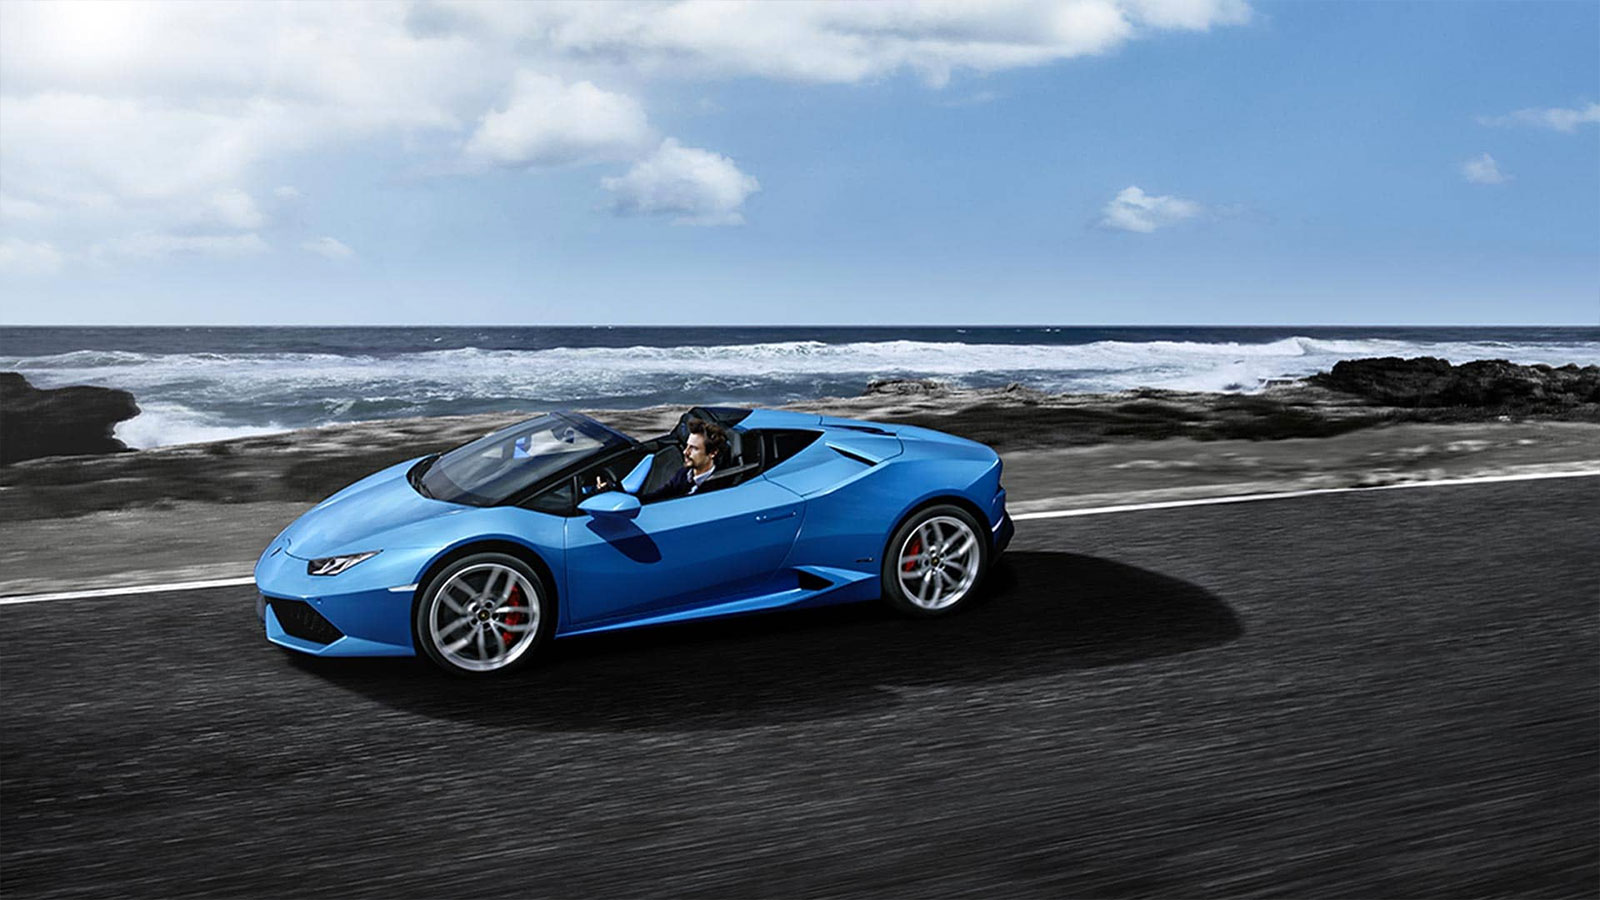 Lamborghini Huracan AWD Spyder - Inspiring Technology image 1